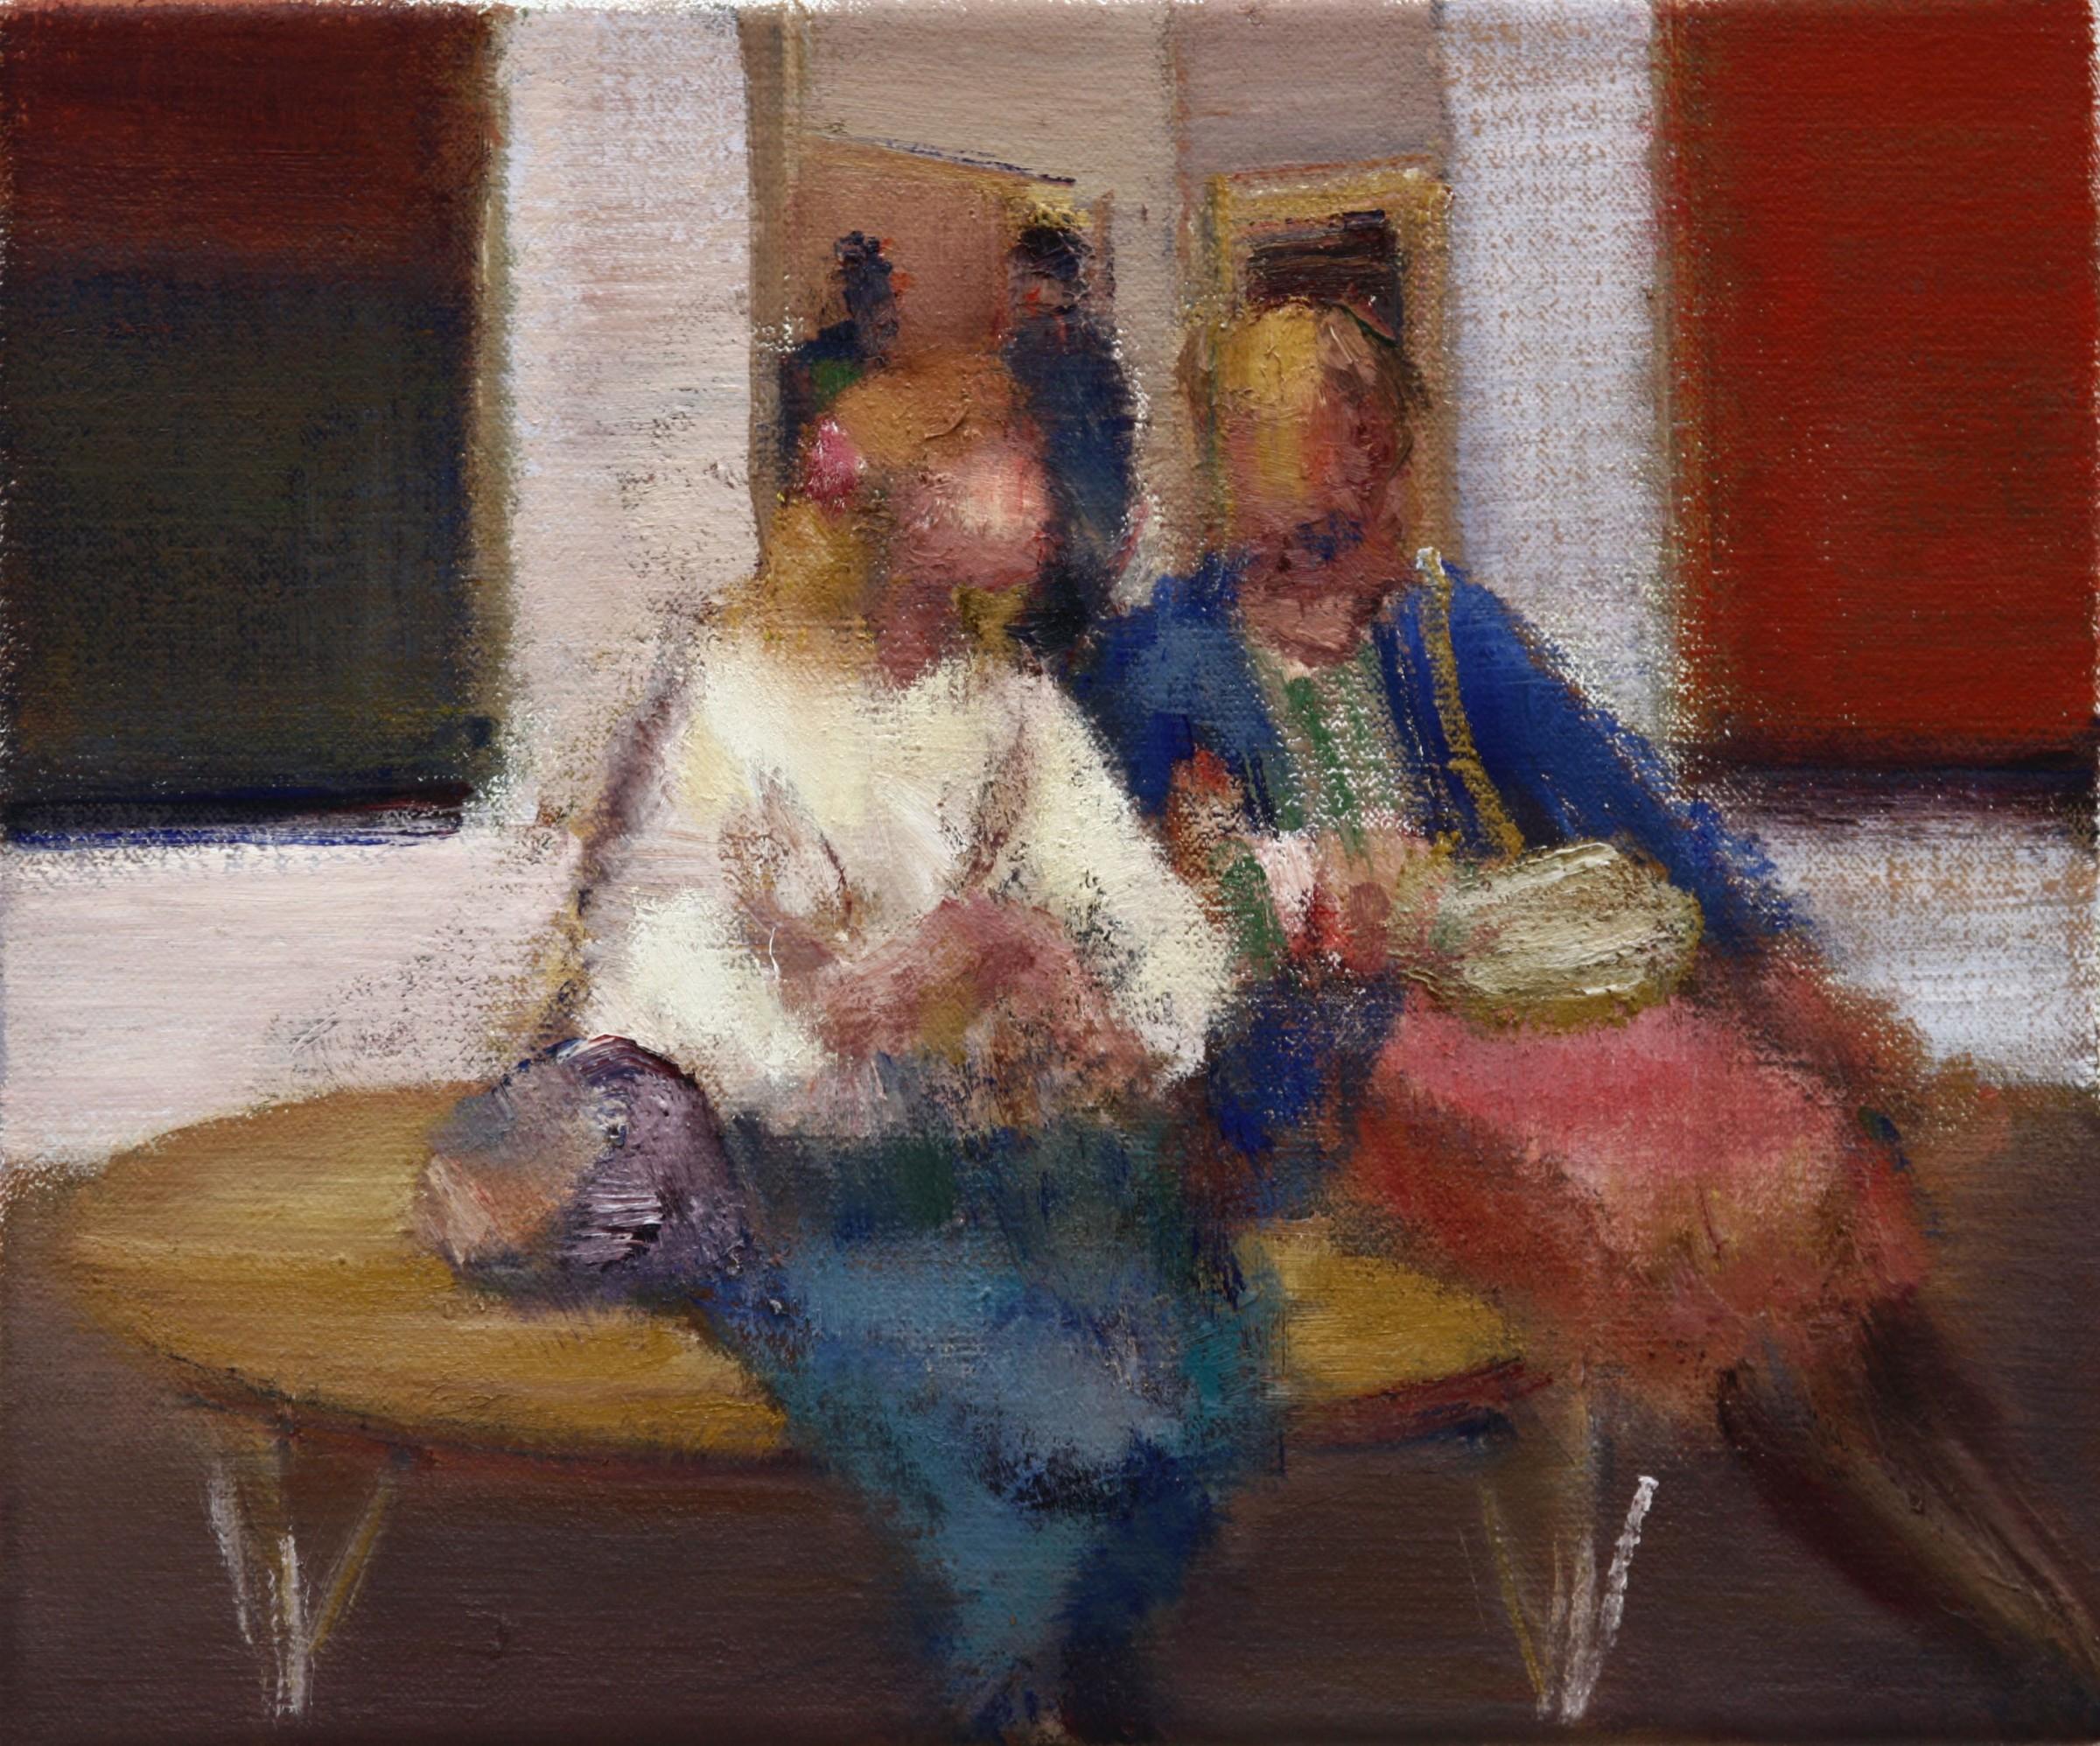 "<span class=""link fancybox-details-link""><a href=""/artists/59-simon-nicholas/works/633-simon-nicholas-gallery-study-5/"">View Detail Page</a></span><div class=""artist""><strong>Simon Nicholas</strong></div> <div class=""title""><em>Gallery Study 5</em></div> <div class=""medium"">Oil on Canvas </div> <div class=""dimensions"">10 x 12.5 inches <br /> SOLD</div>"